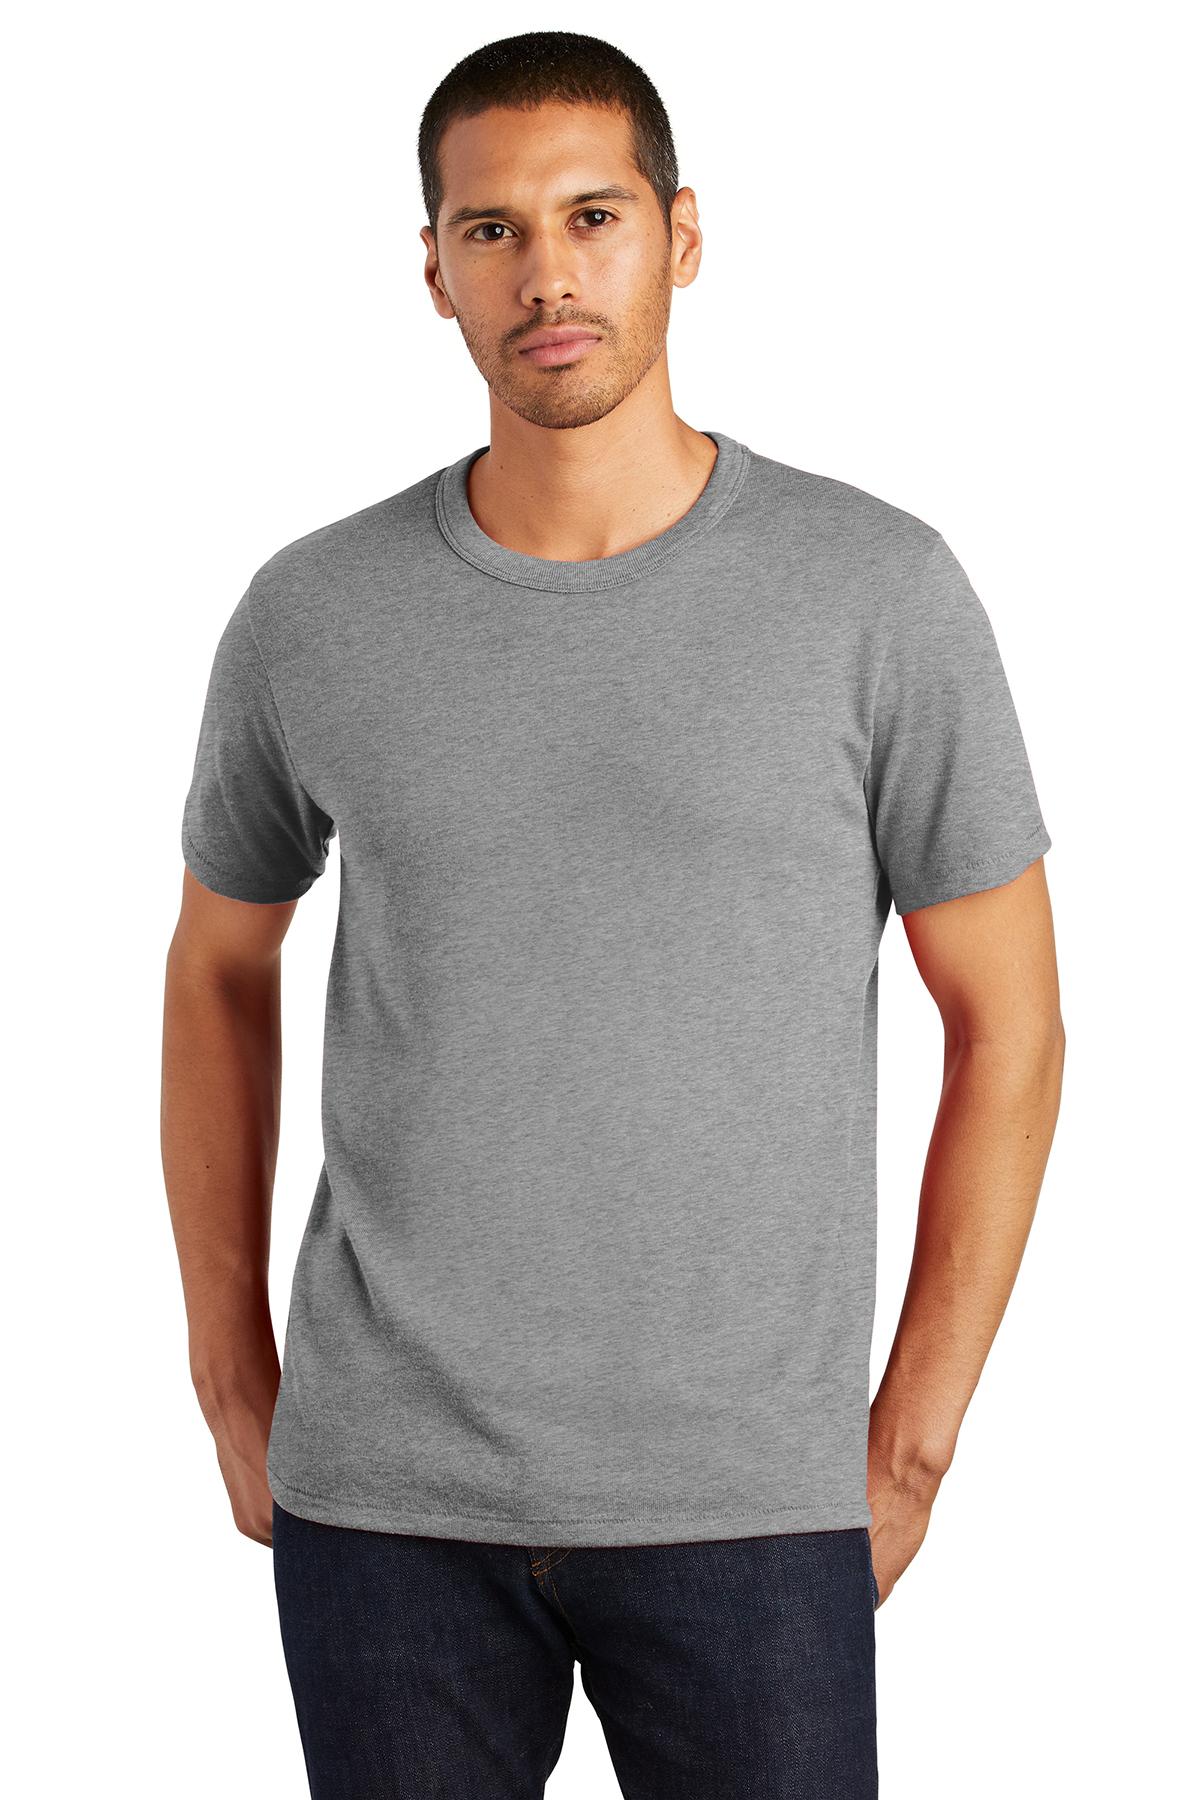 618232e6 Alternative The Keeper Vintage 50/50 Tee | 50/50 Blend | T-Shirts ...